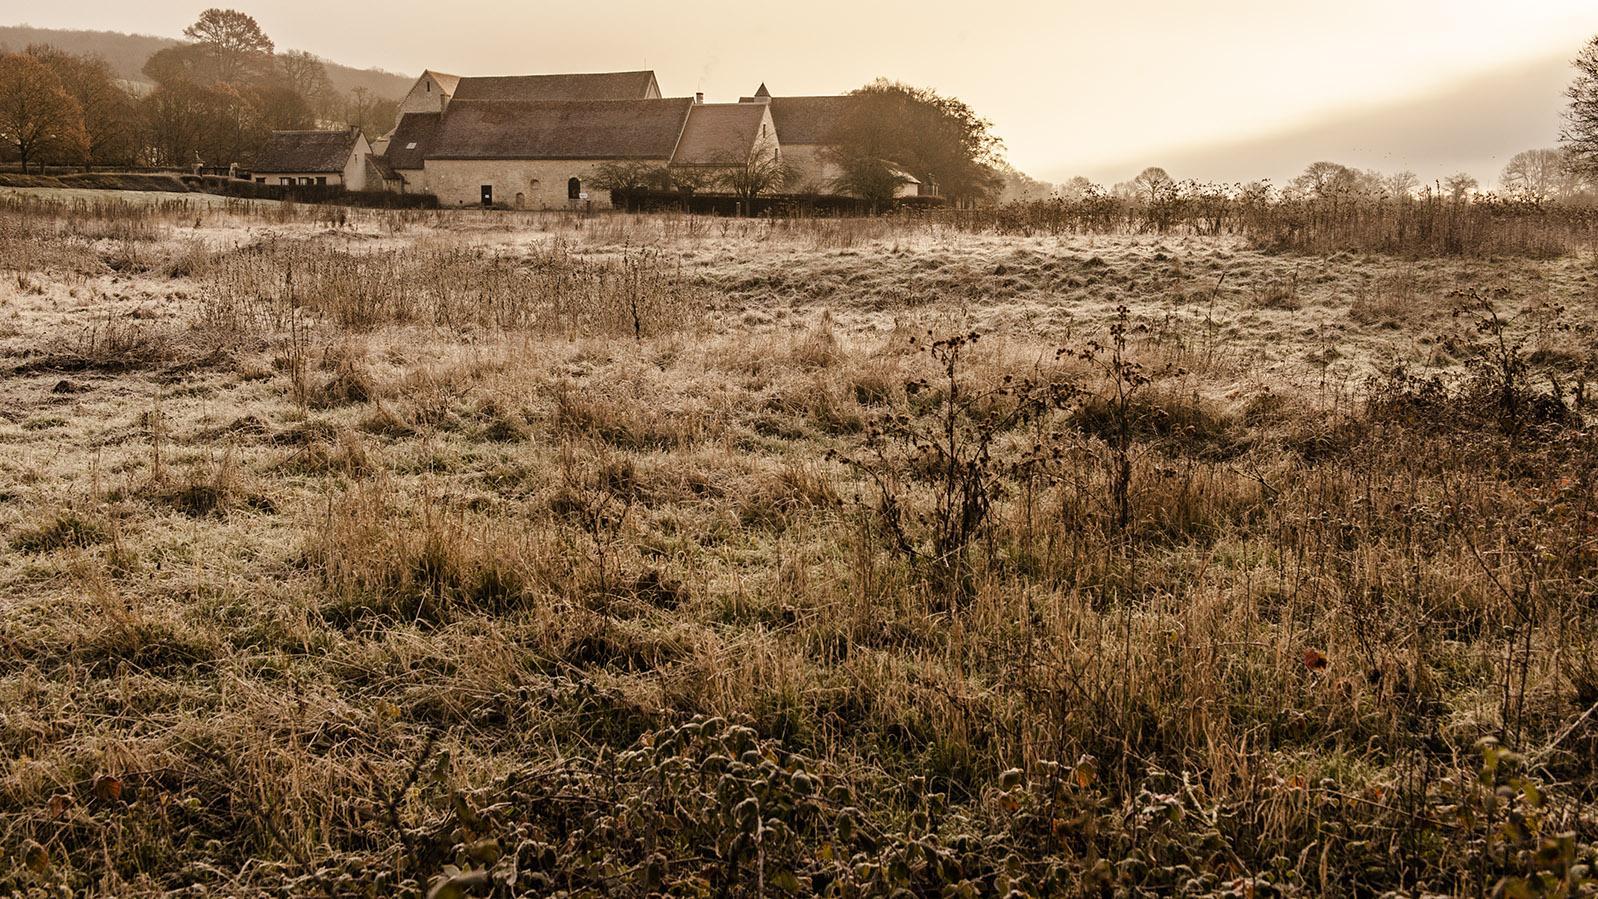 L'Abbaye de Noirlac, eine ehemalige Zisterzienserabtei Bruère-Allichamps im Berry. Foto: Hilke Maunder